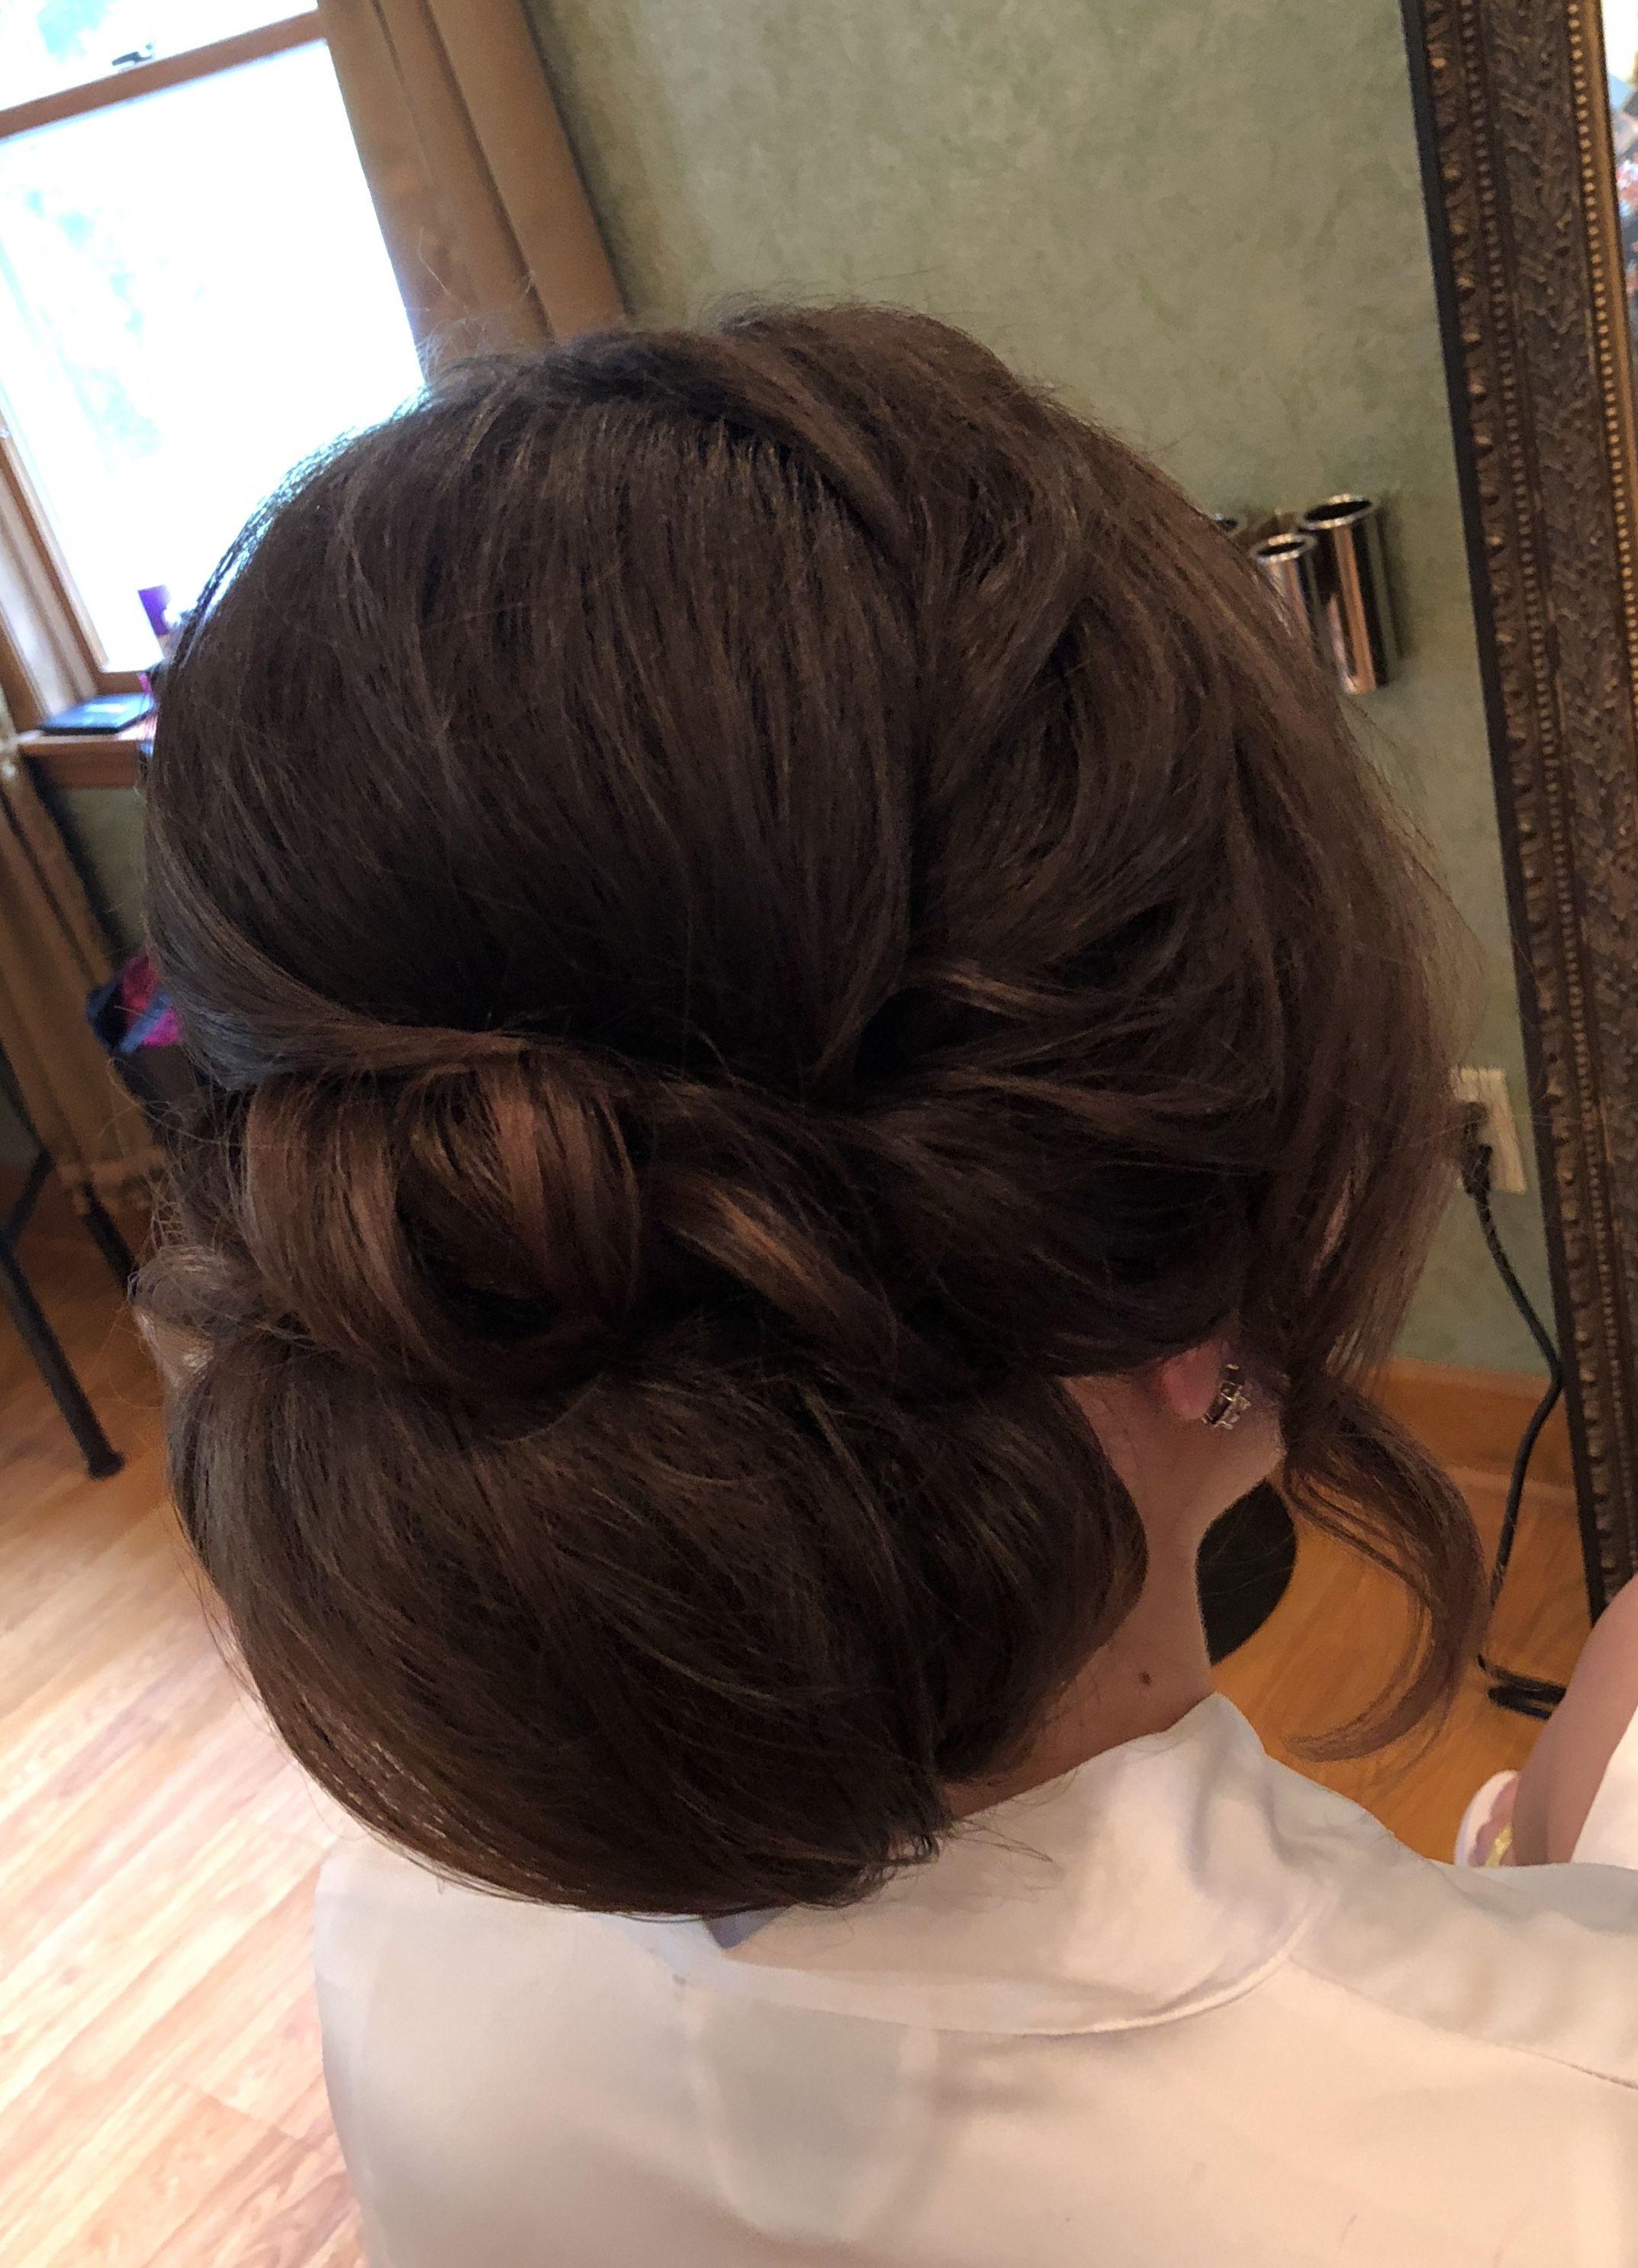 bridal bun, wedding hairstyle, wedding bun, bridal updo